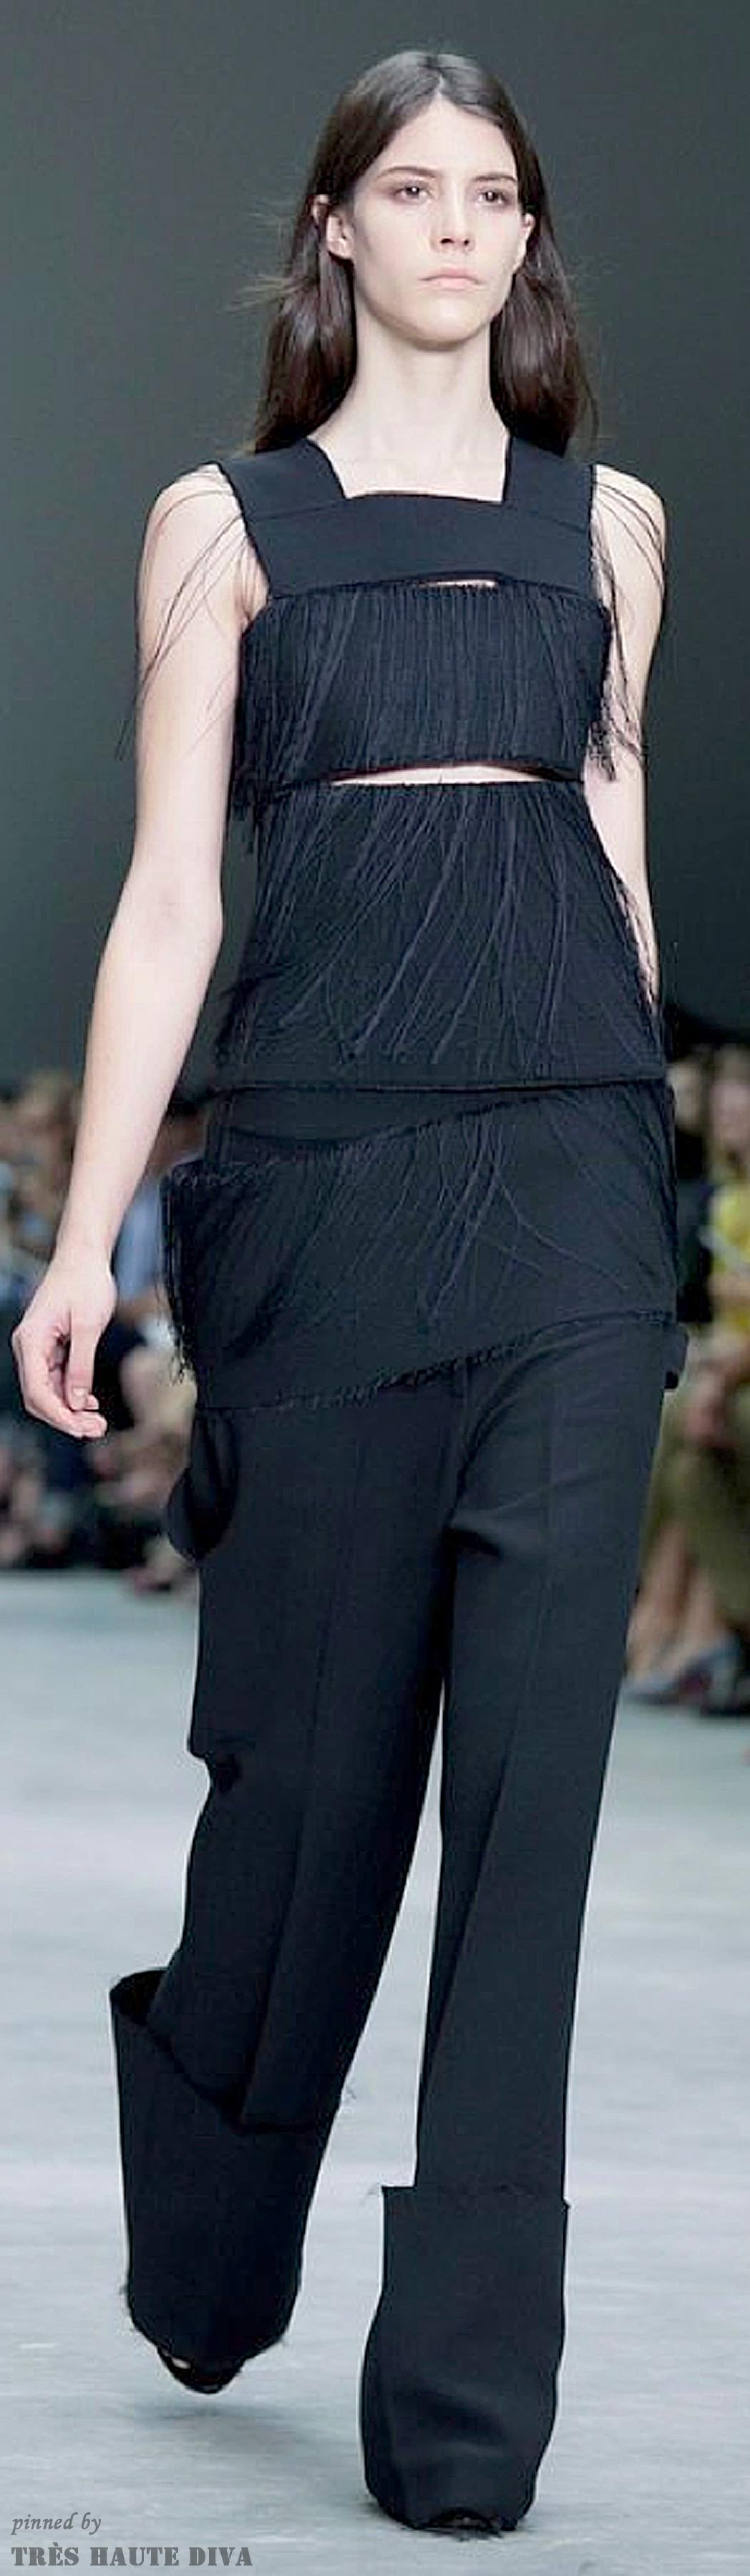 #NYFW Calvin Klein 2014 RTW www.nytimes.com/...